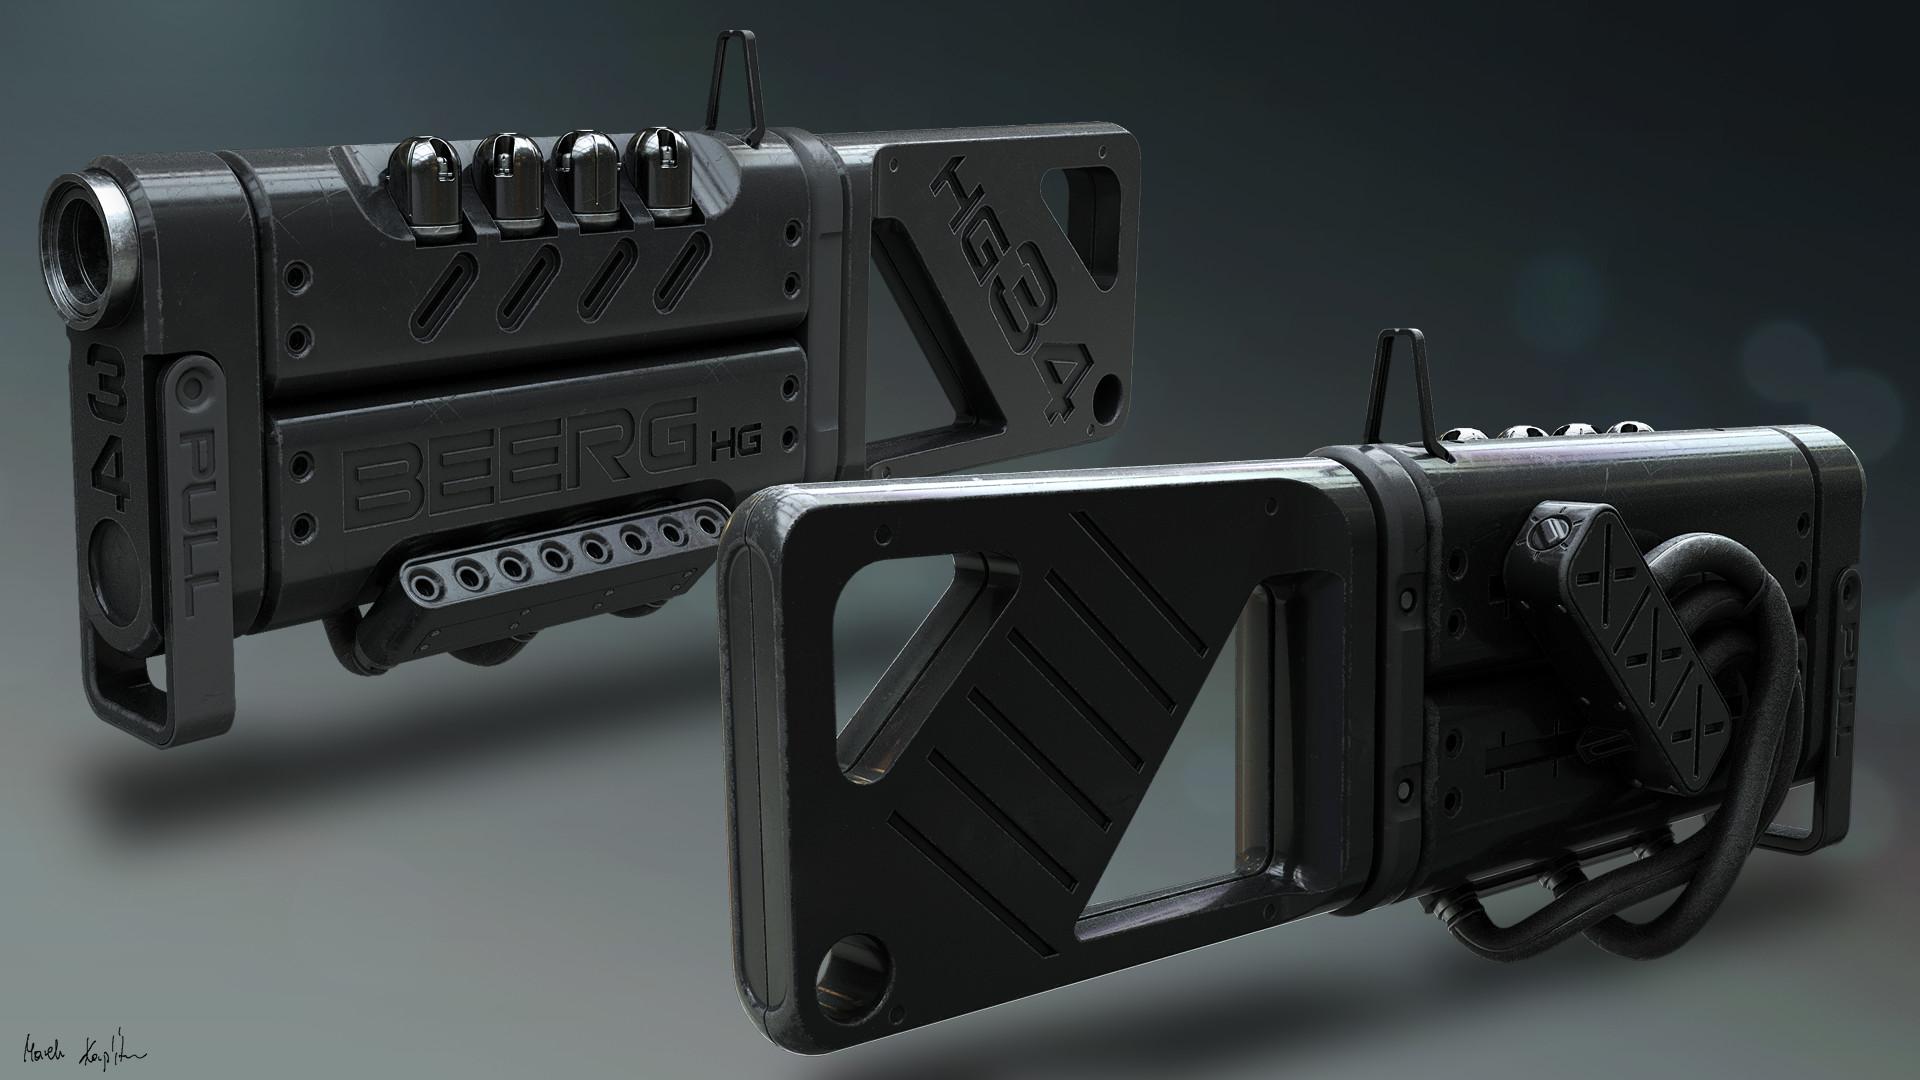 marek-kaplita-gun1-persp1.jpg